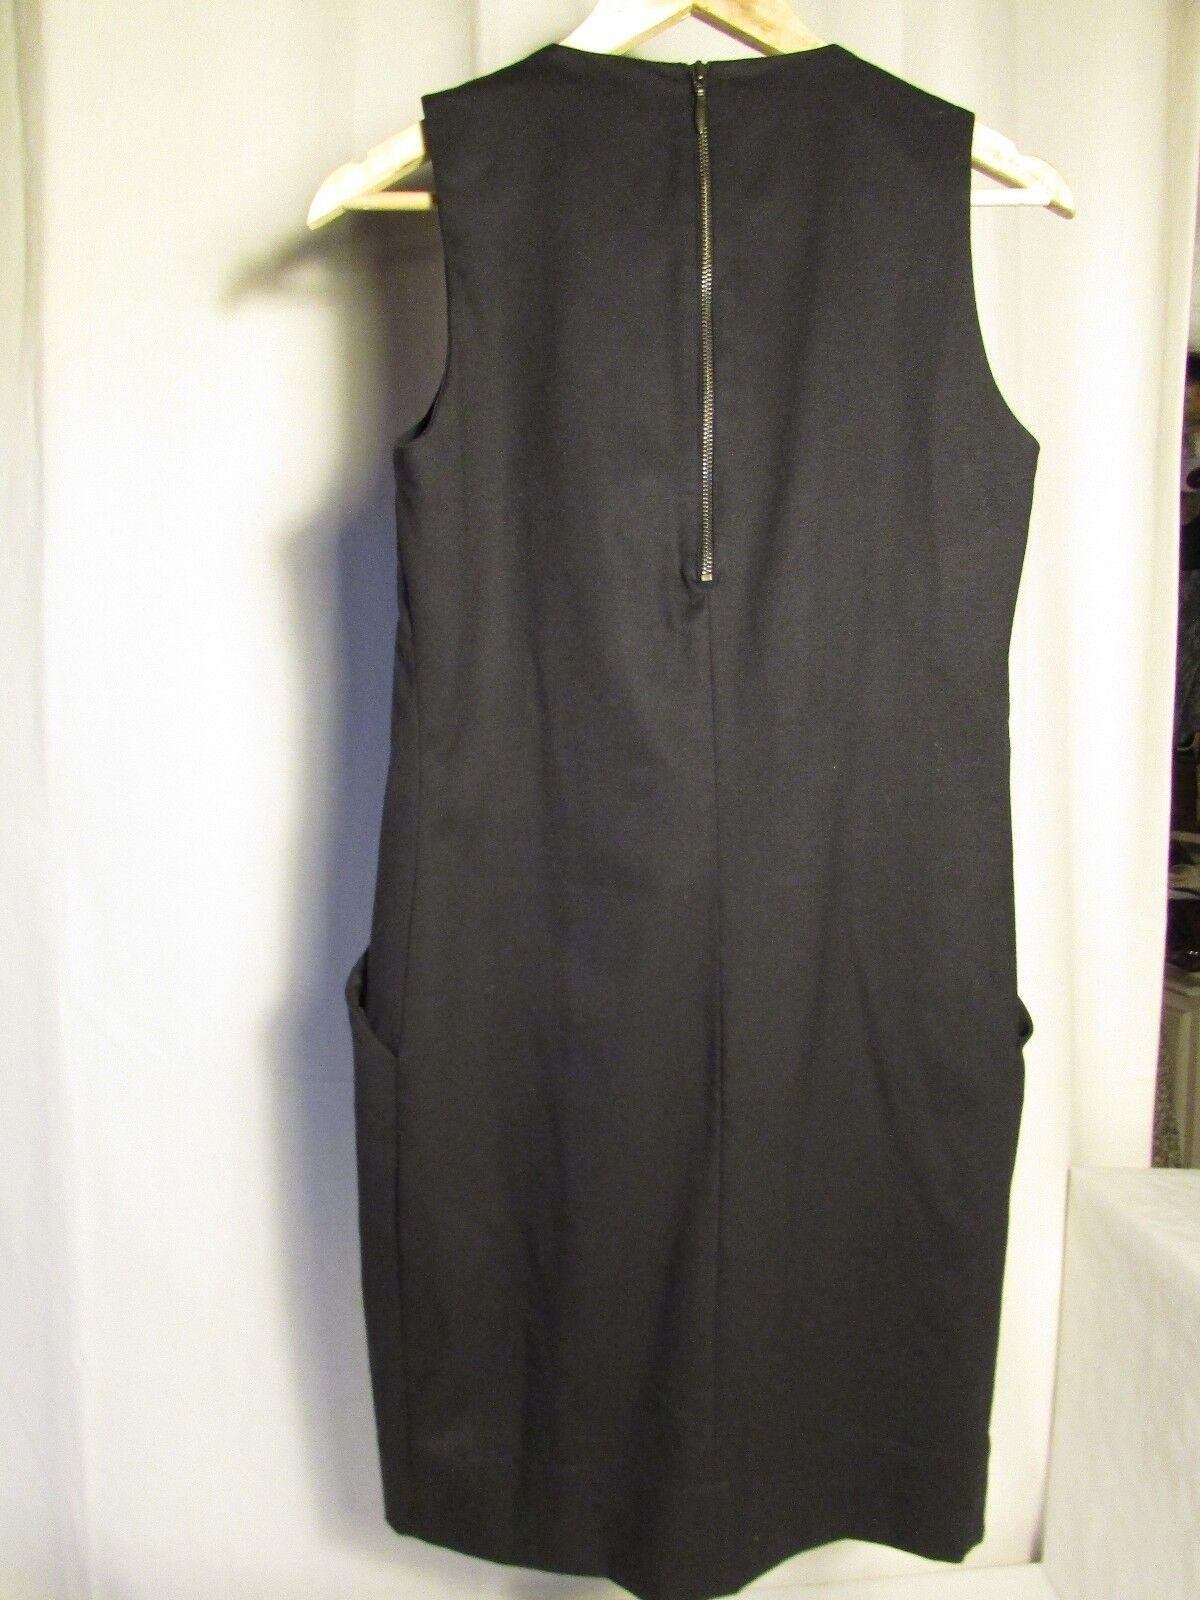 Dress SANDRO wool navy navy navy bluee size 2 69c9b1